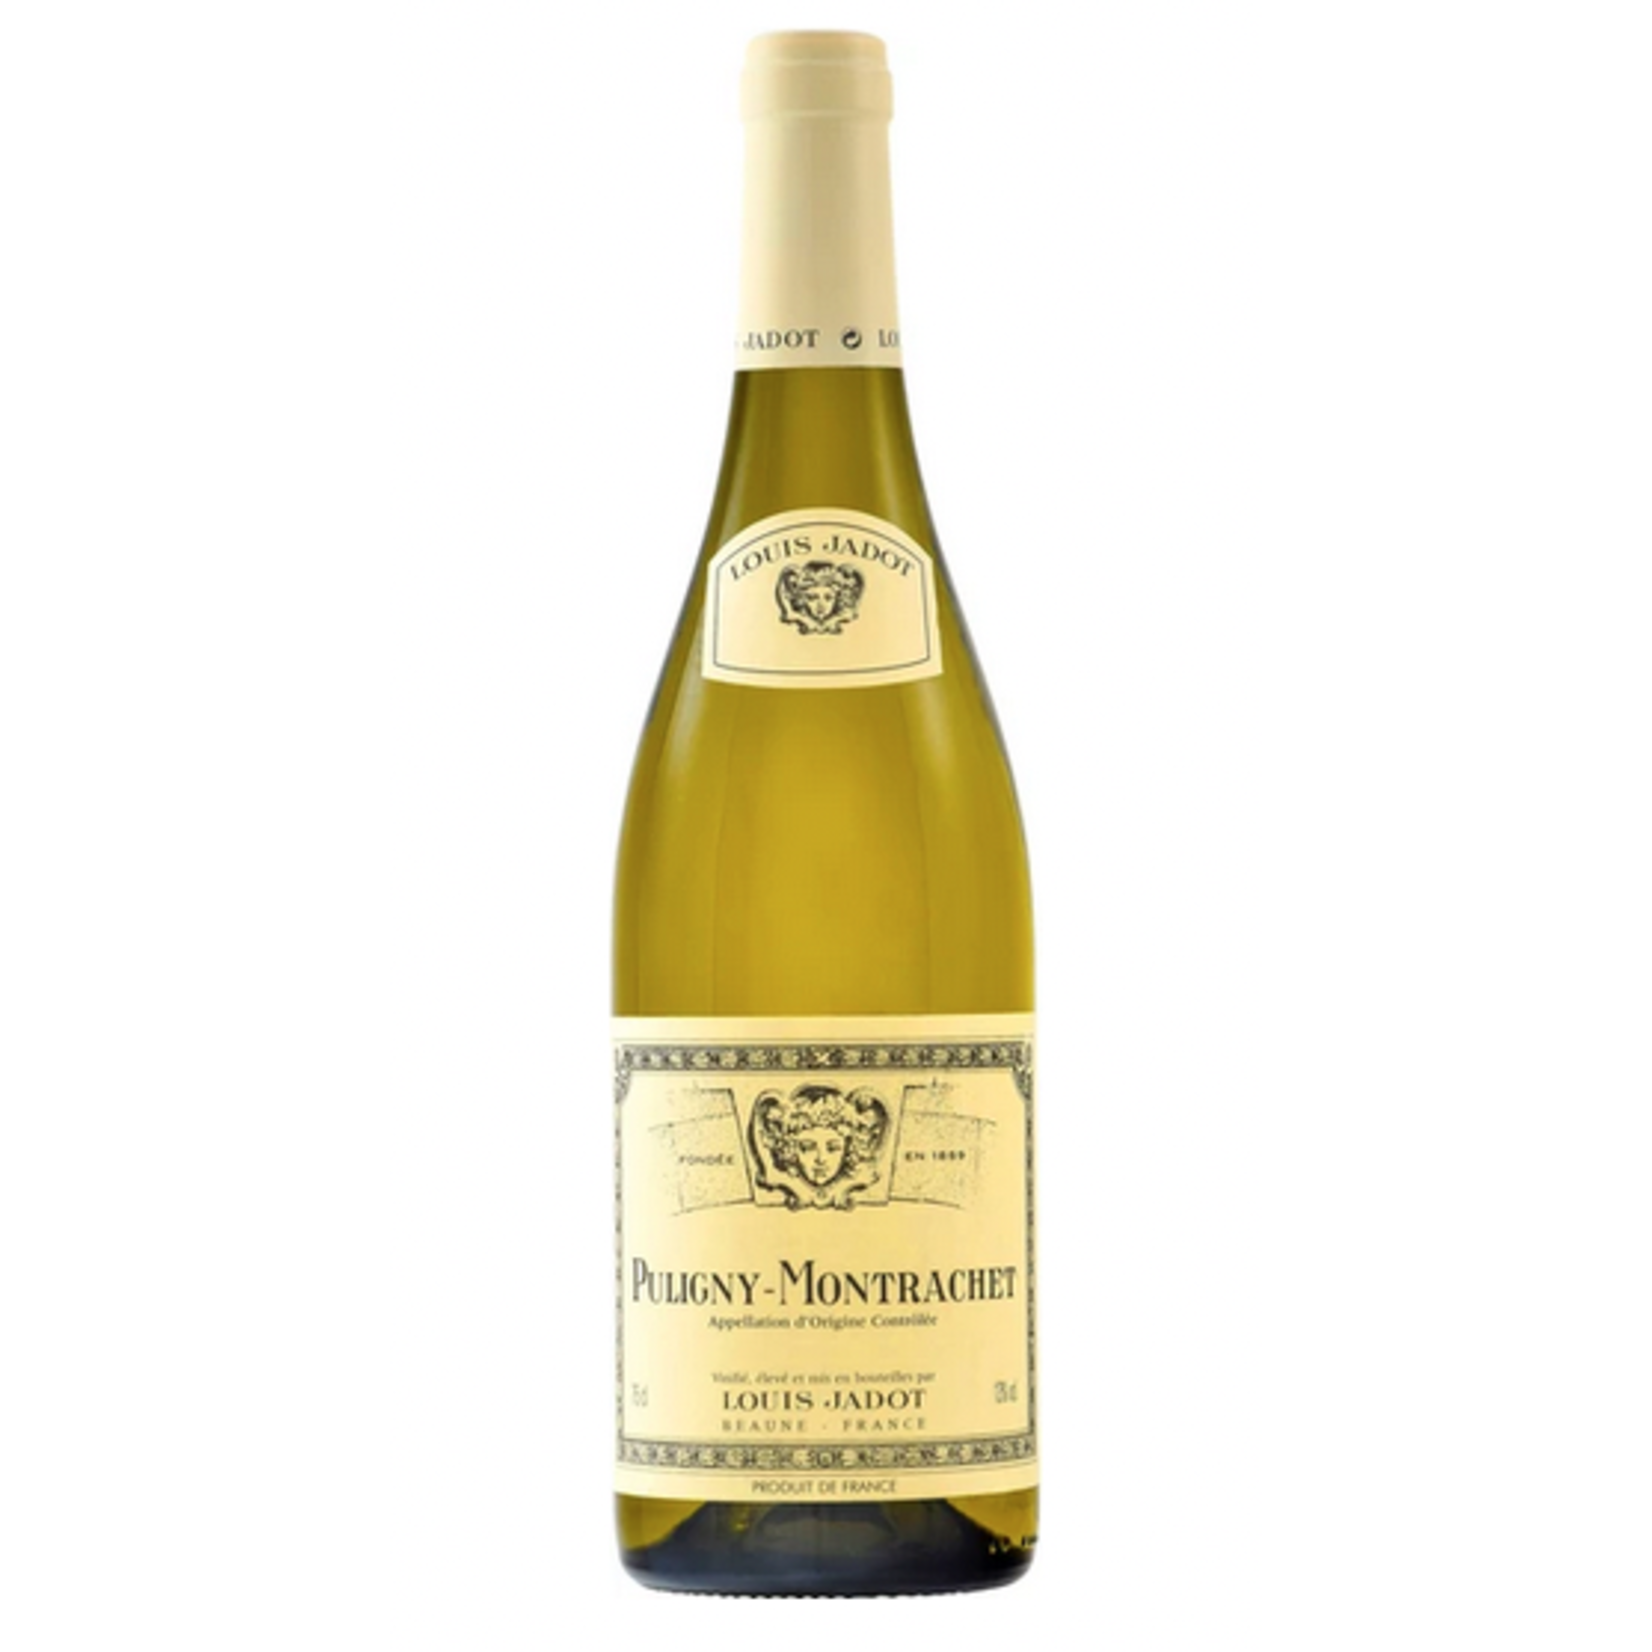 Wine Louis Jadot Puligny-Montrachet (Maison Louis Jadot) 2019